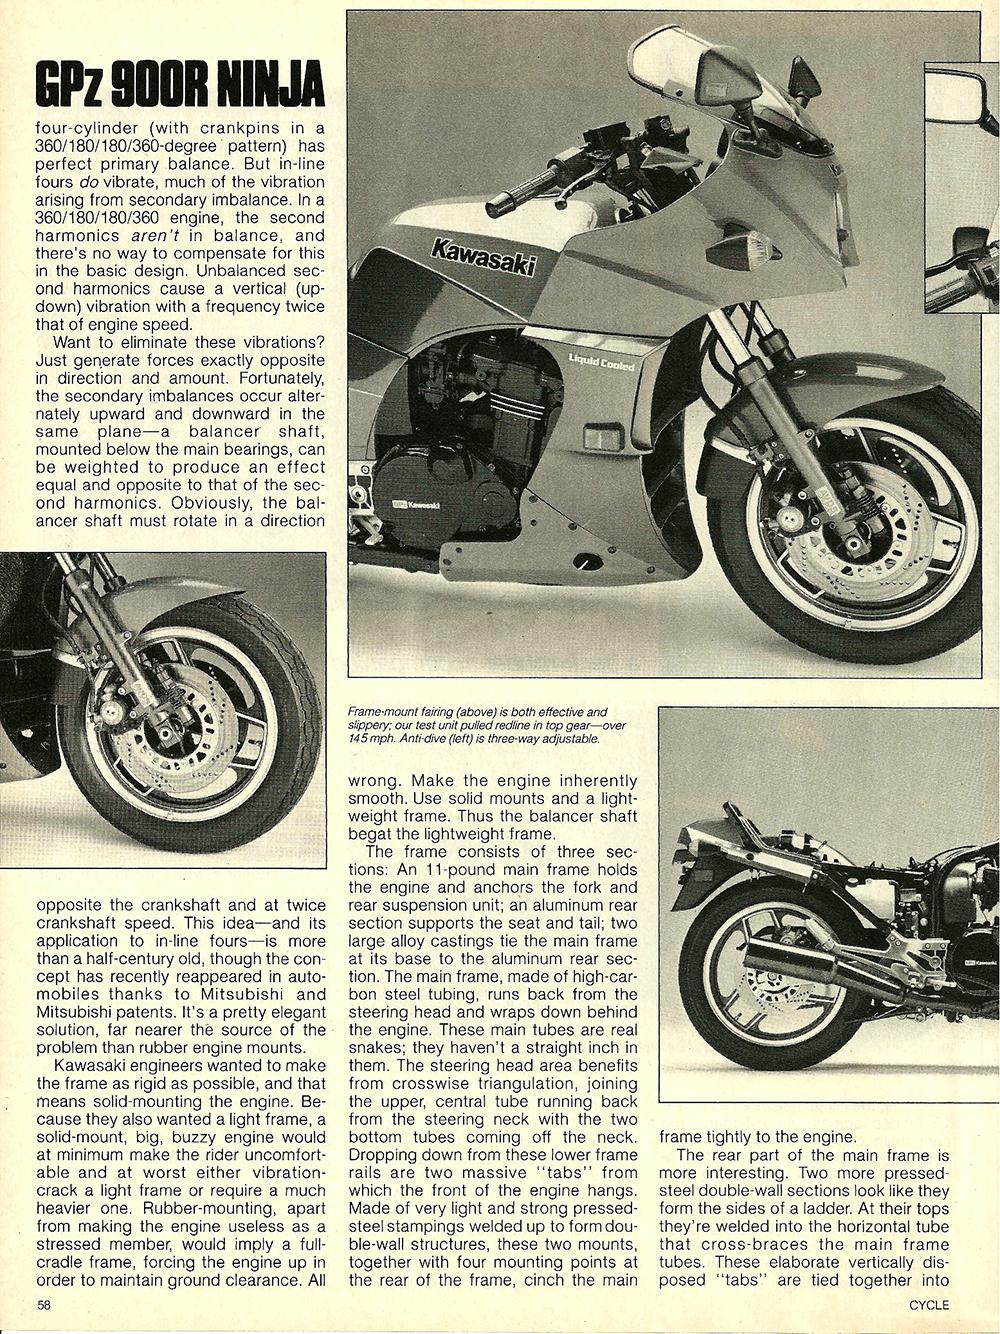 1984 Kawasaki GPz 900R Ninja road test 04.jpg